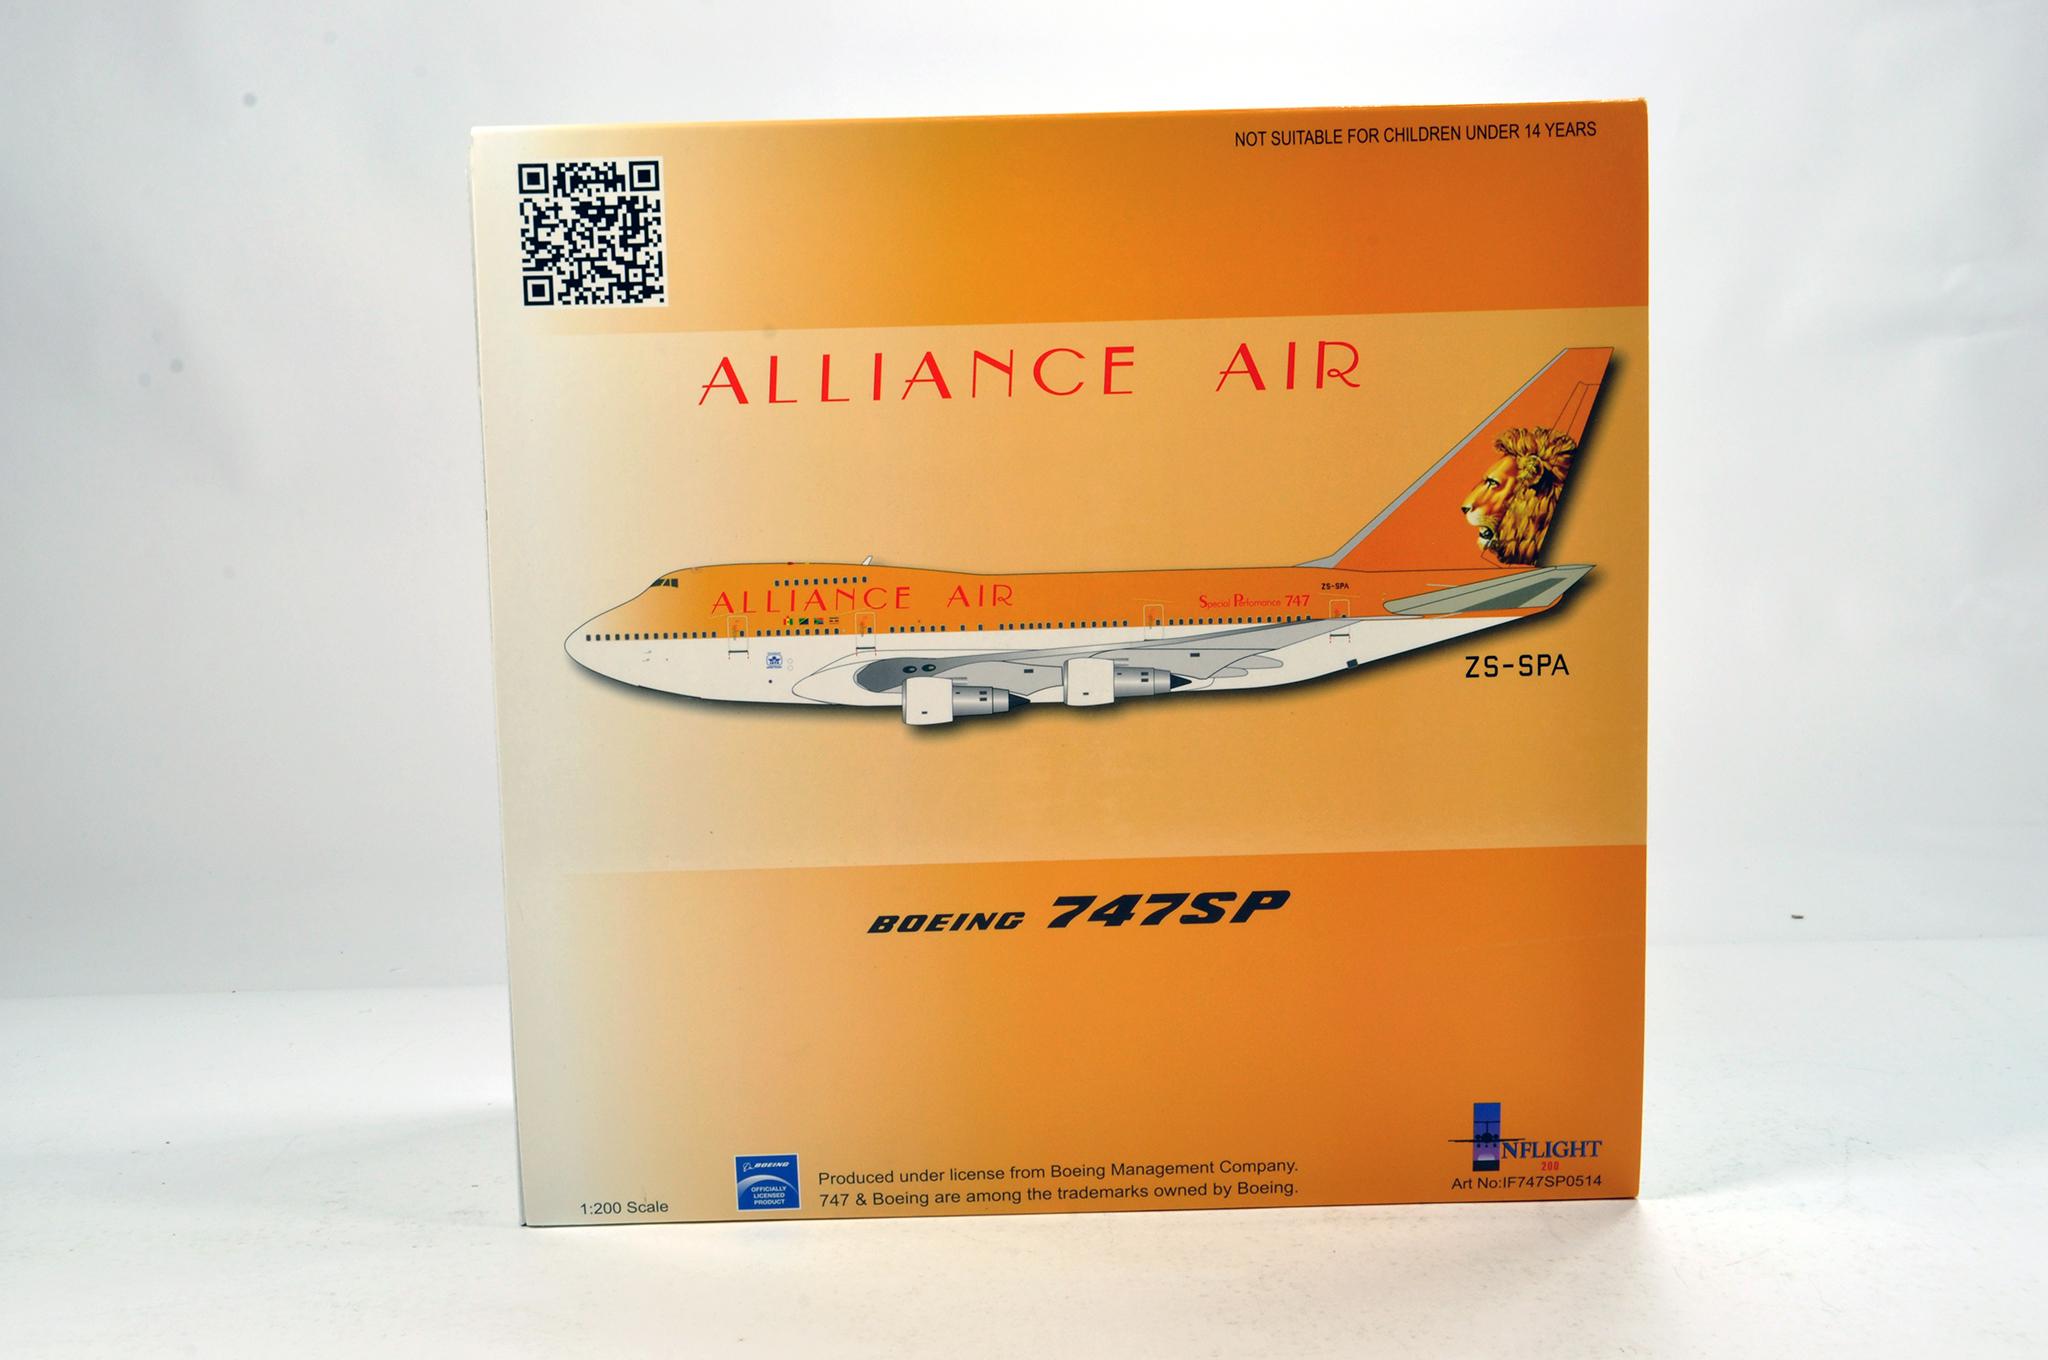 Lot 30 - Inflight Models 1/200 Diecast Aircraft Models comprising Boeing 747SP Alliance Air. Graded ex shop